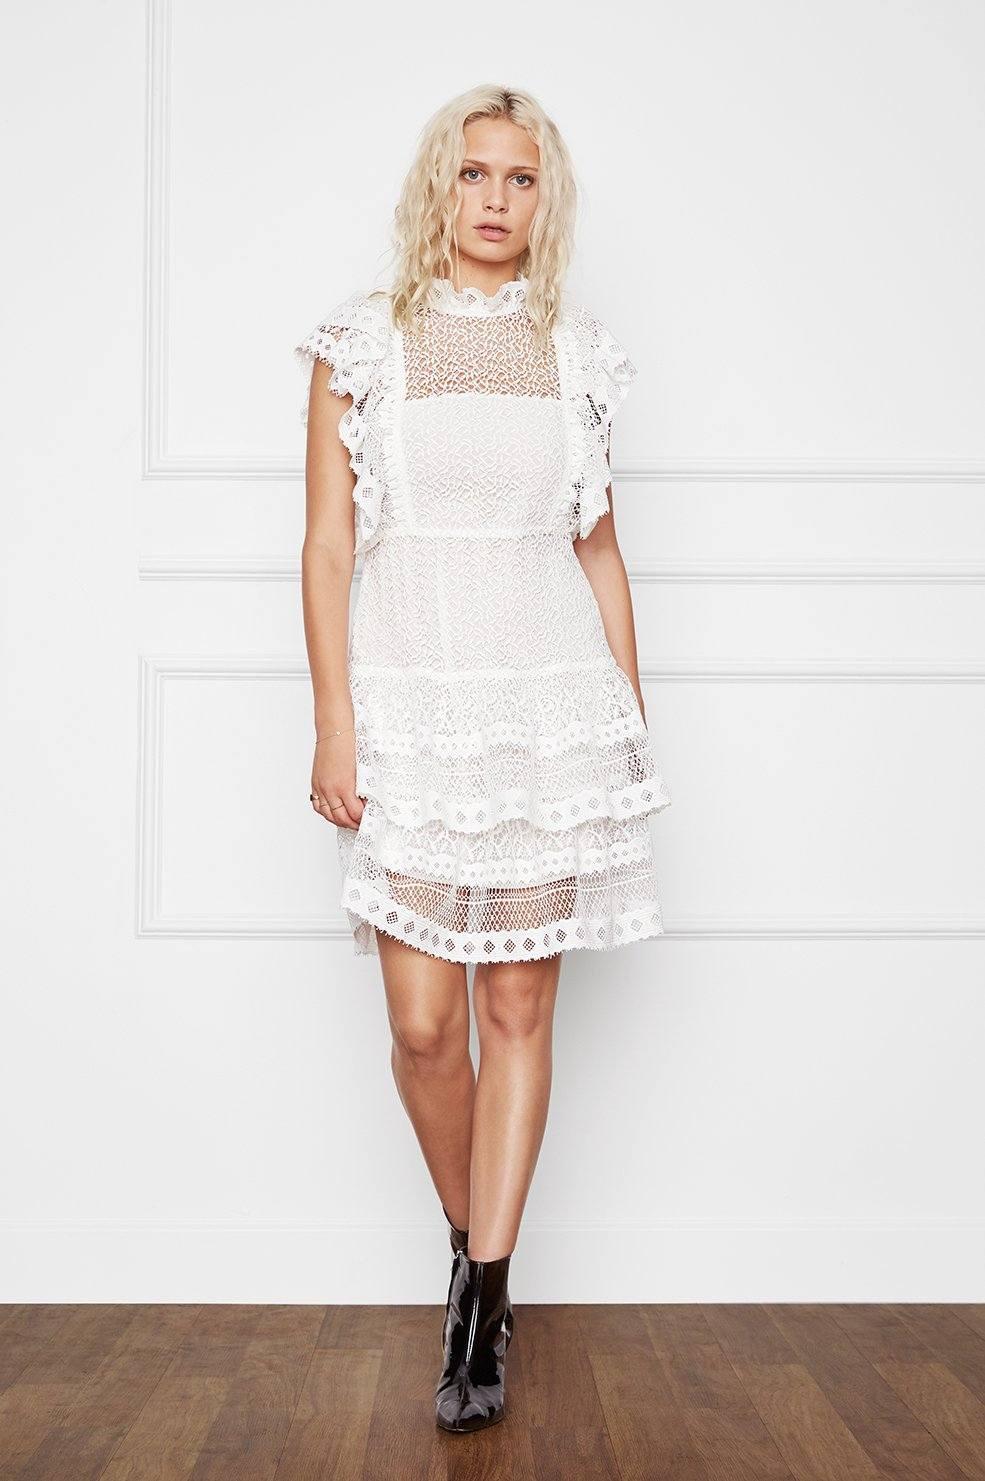 ANINE-BING-PENELOPE-DRESS-WHITE-AB21-038-01_1286.jpg